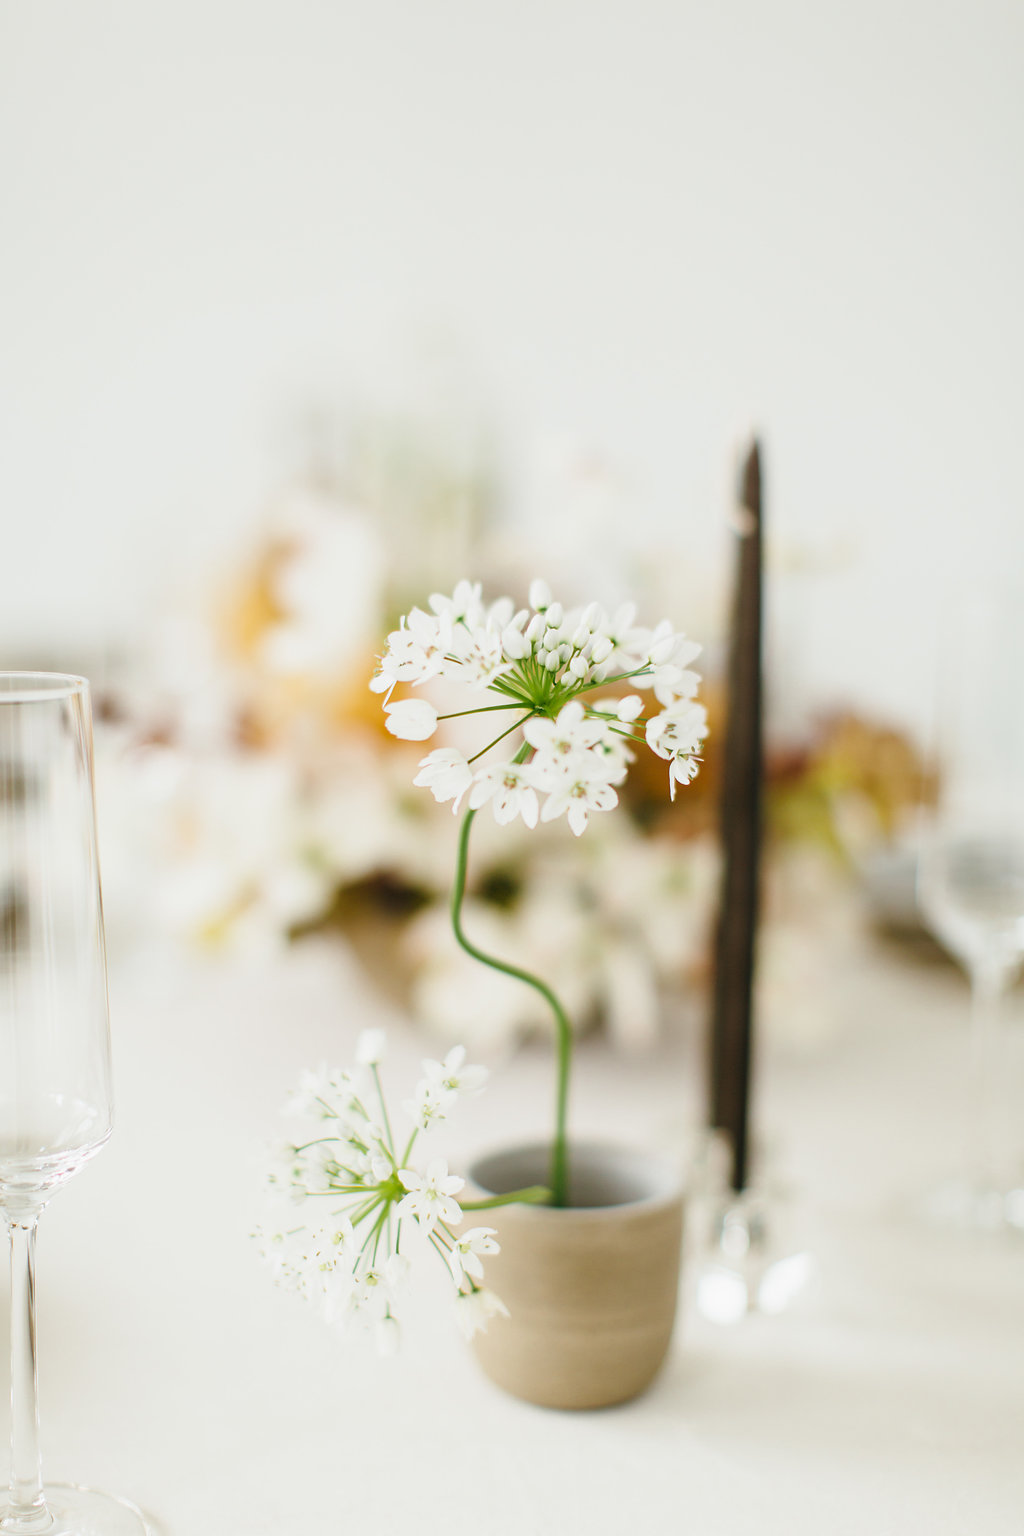 Bleedfoot Florals Modern Minimal Spring Editorial